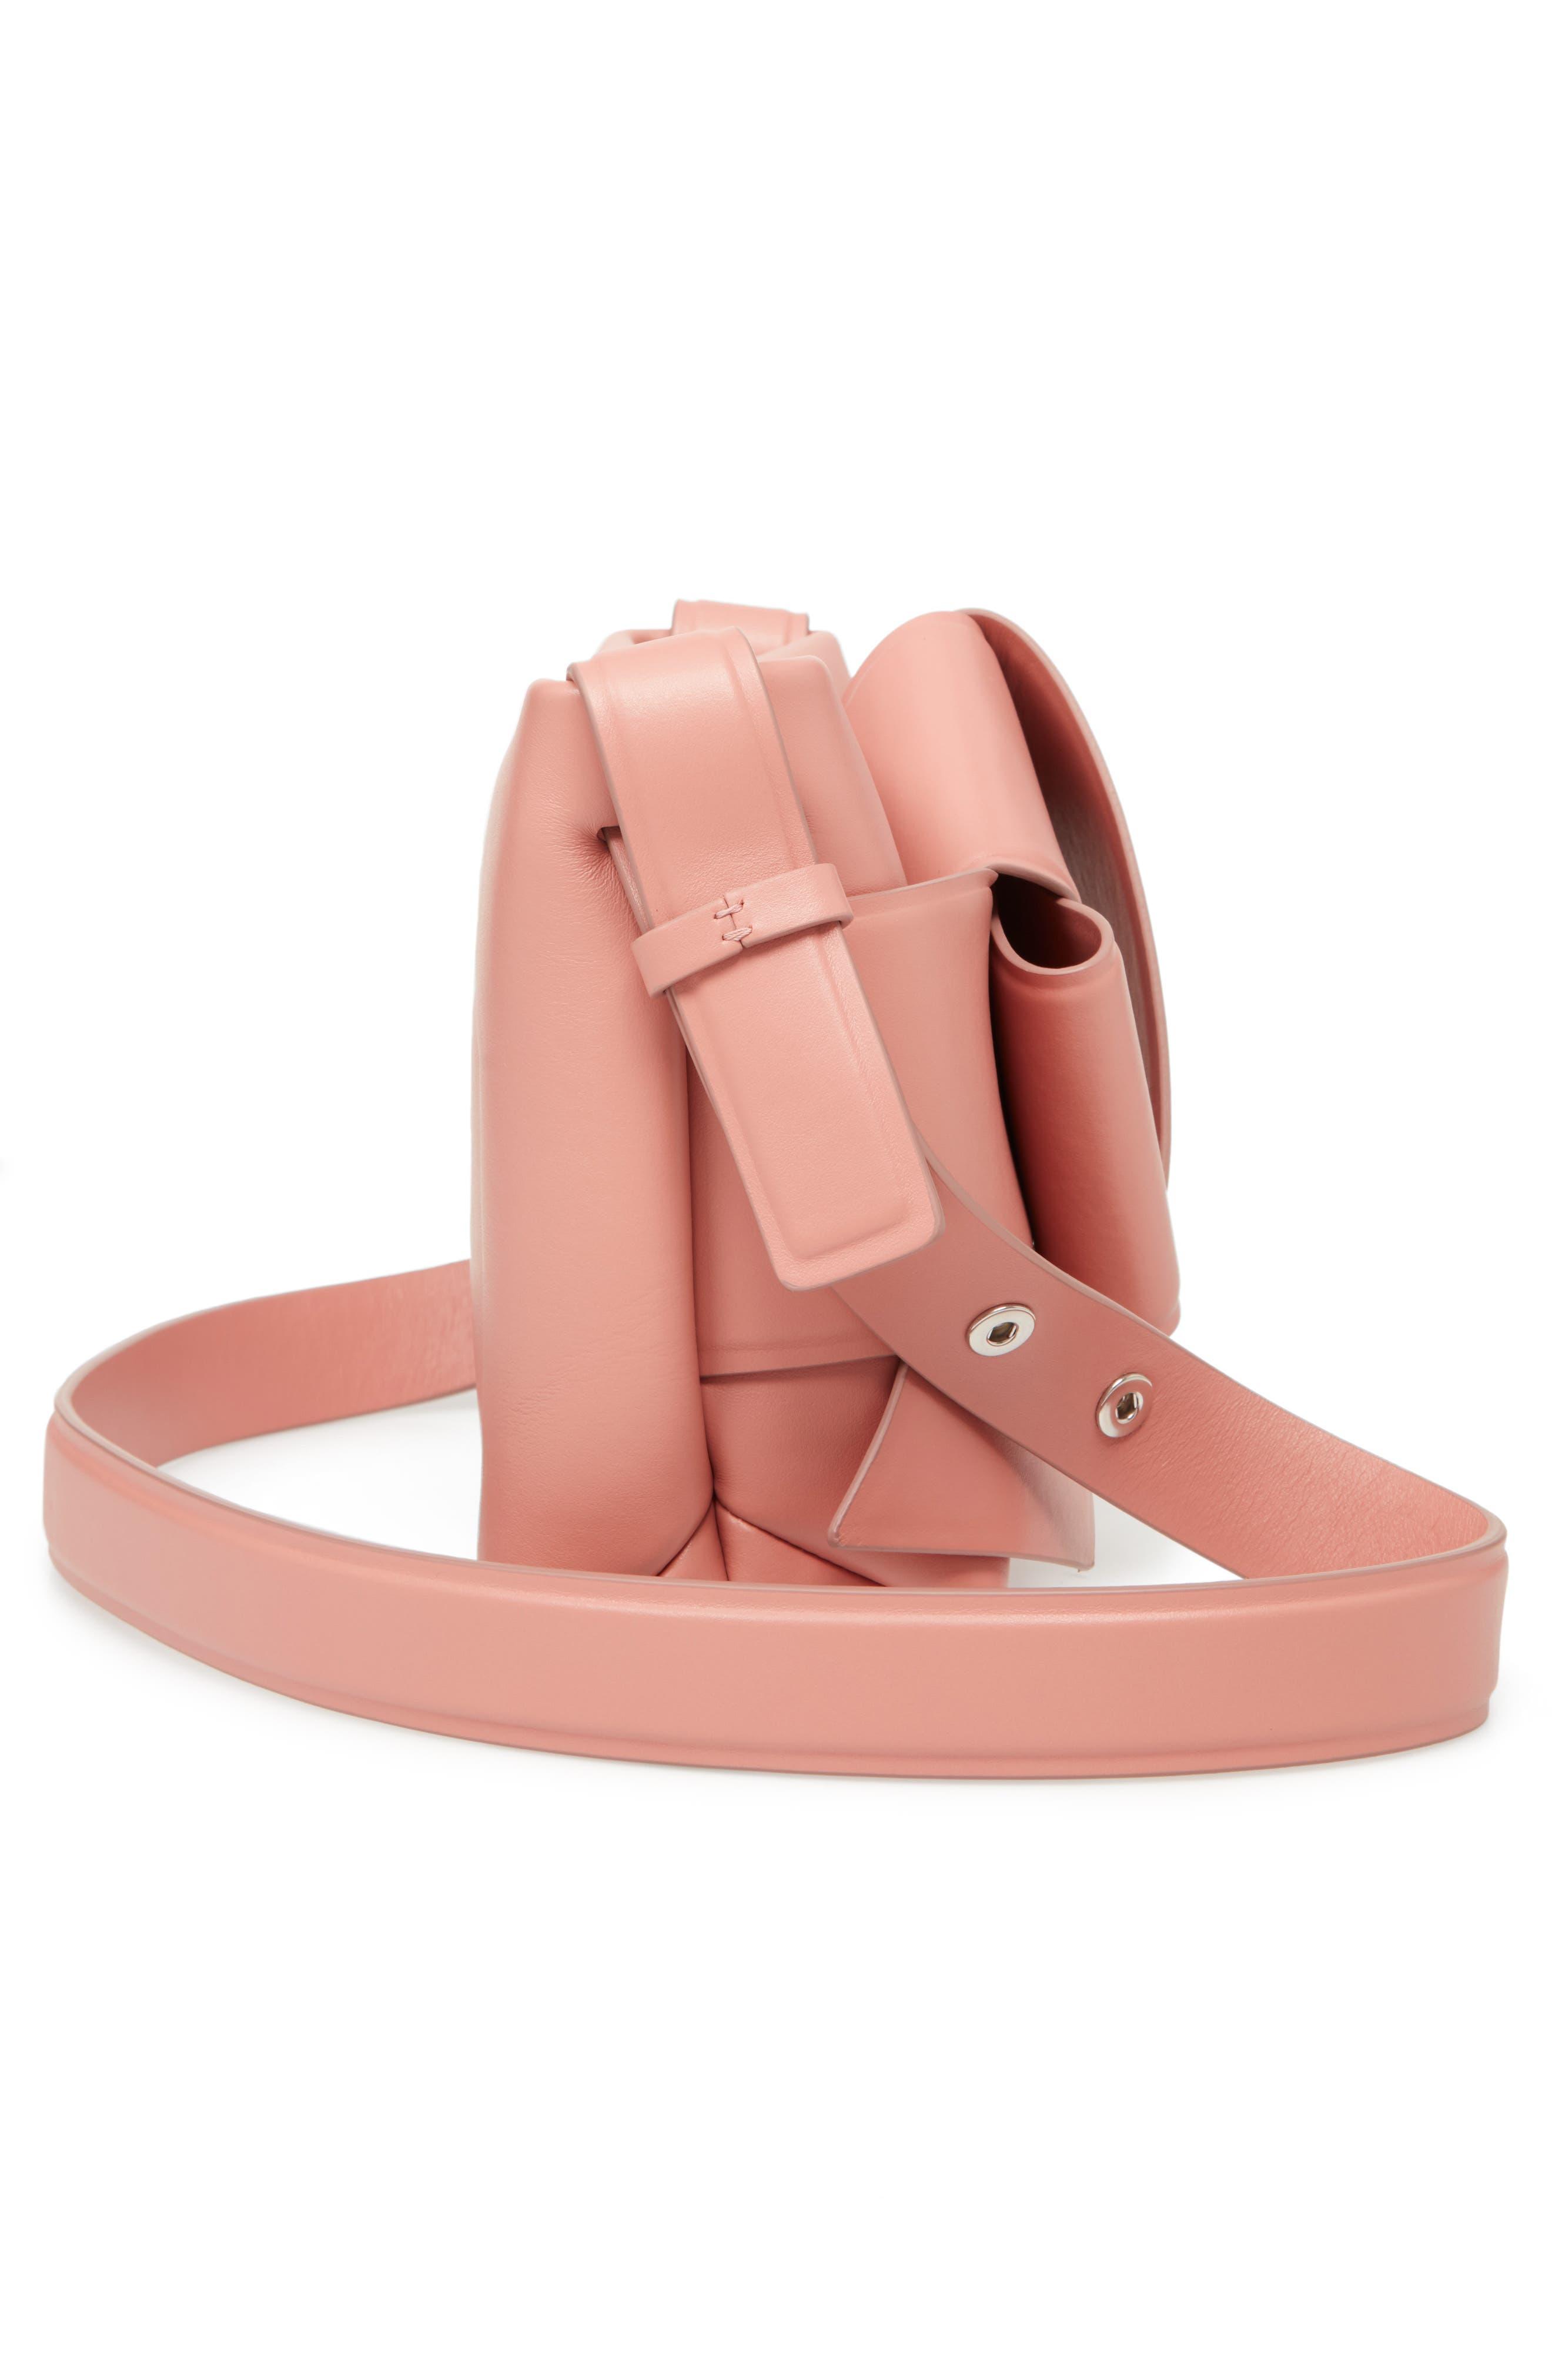 Musubi Knot Leather Handbag,                             Alternate thumbnail 5, color,                             PINK